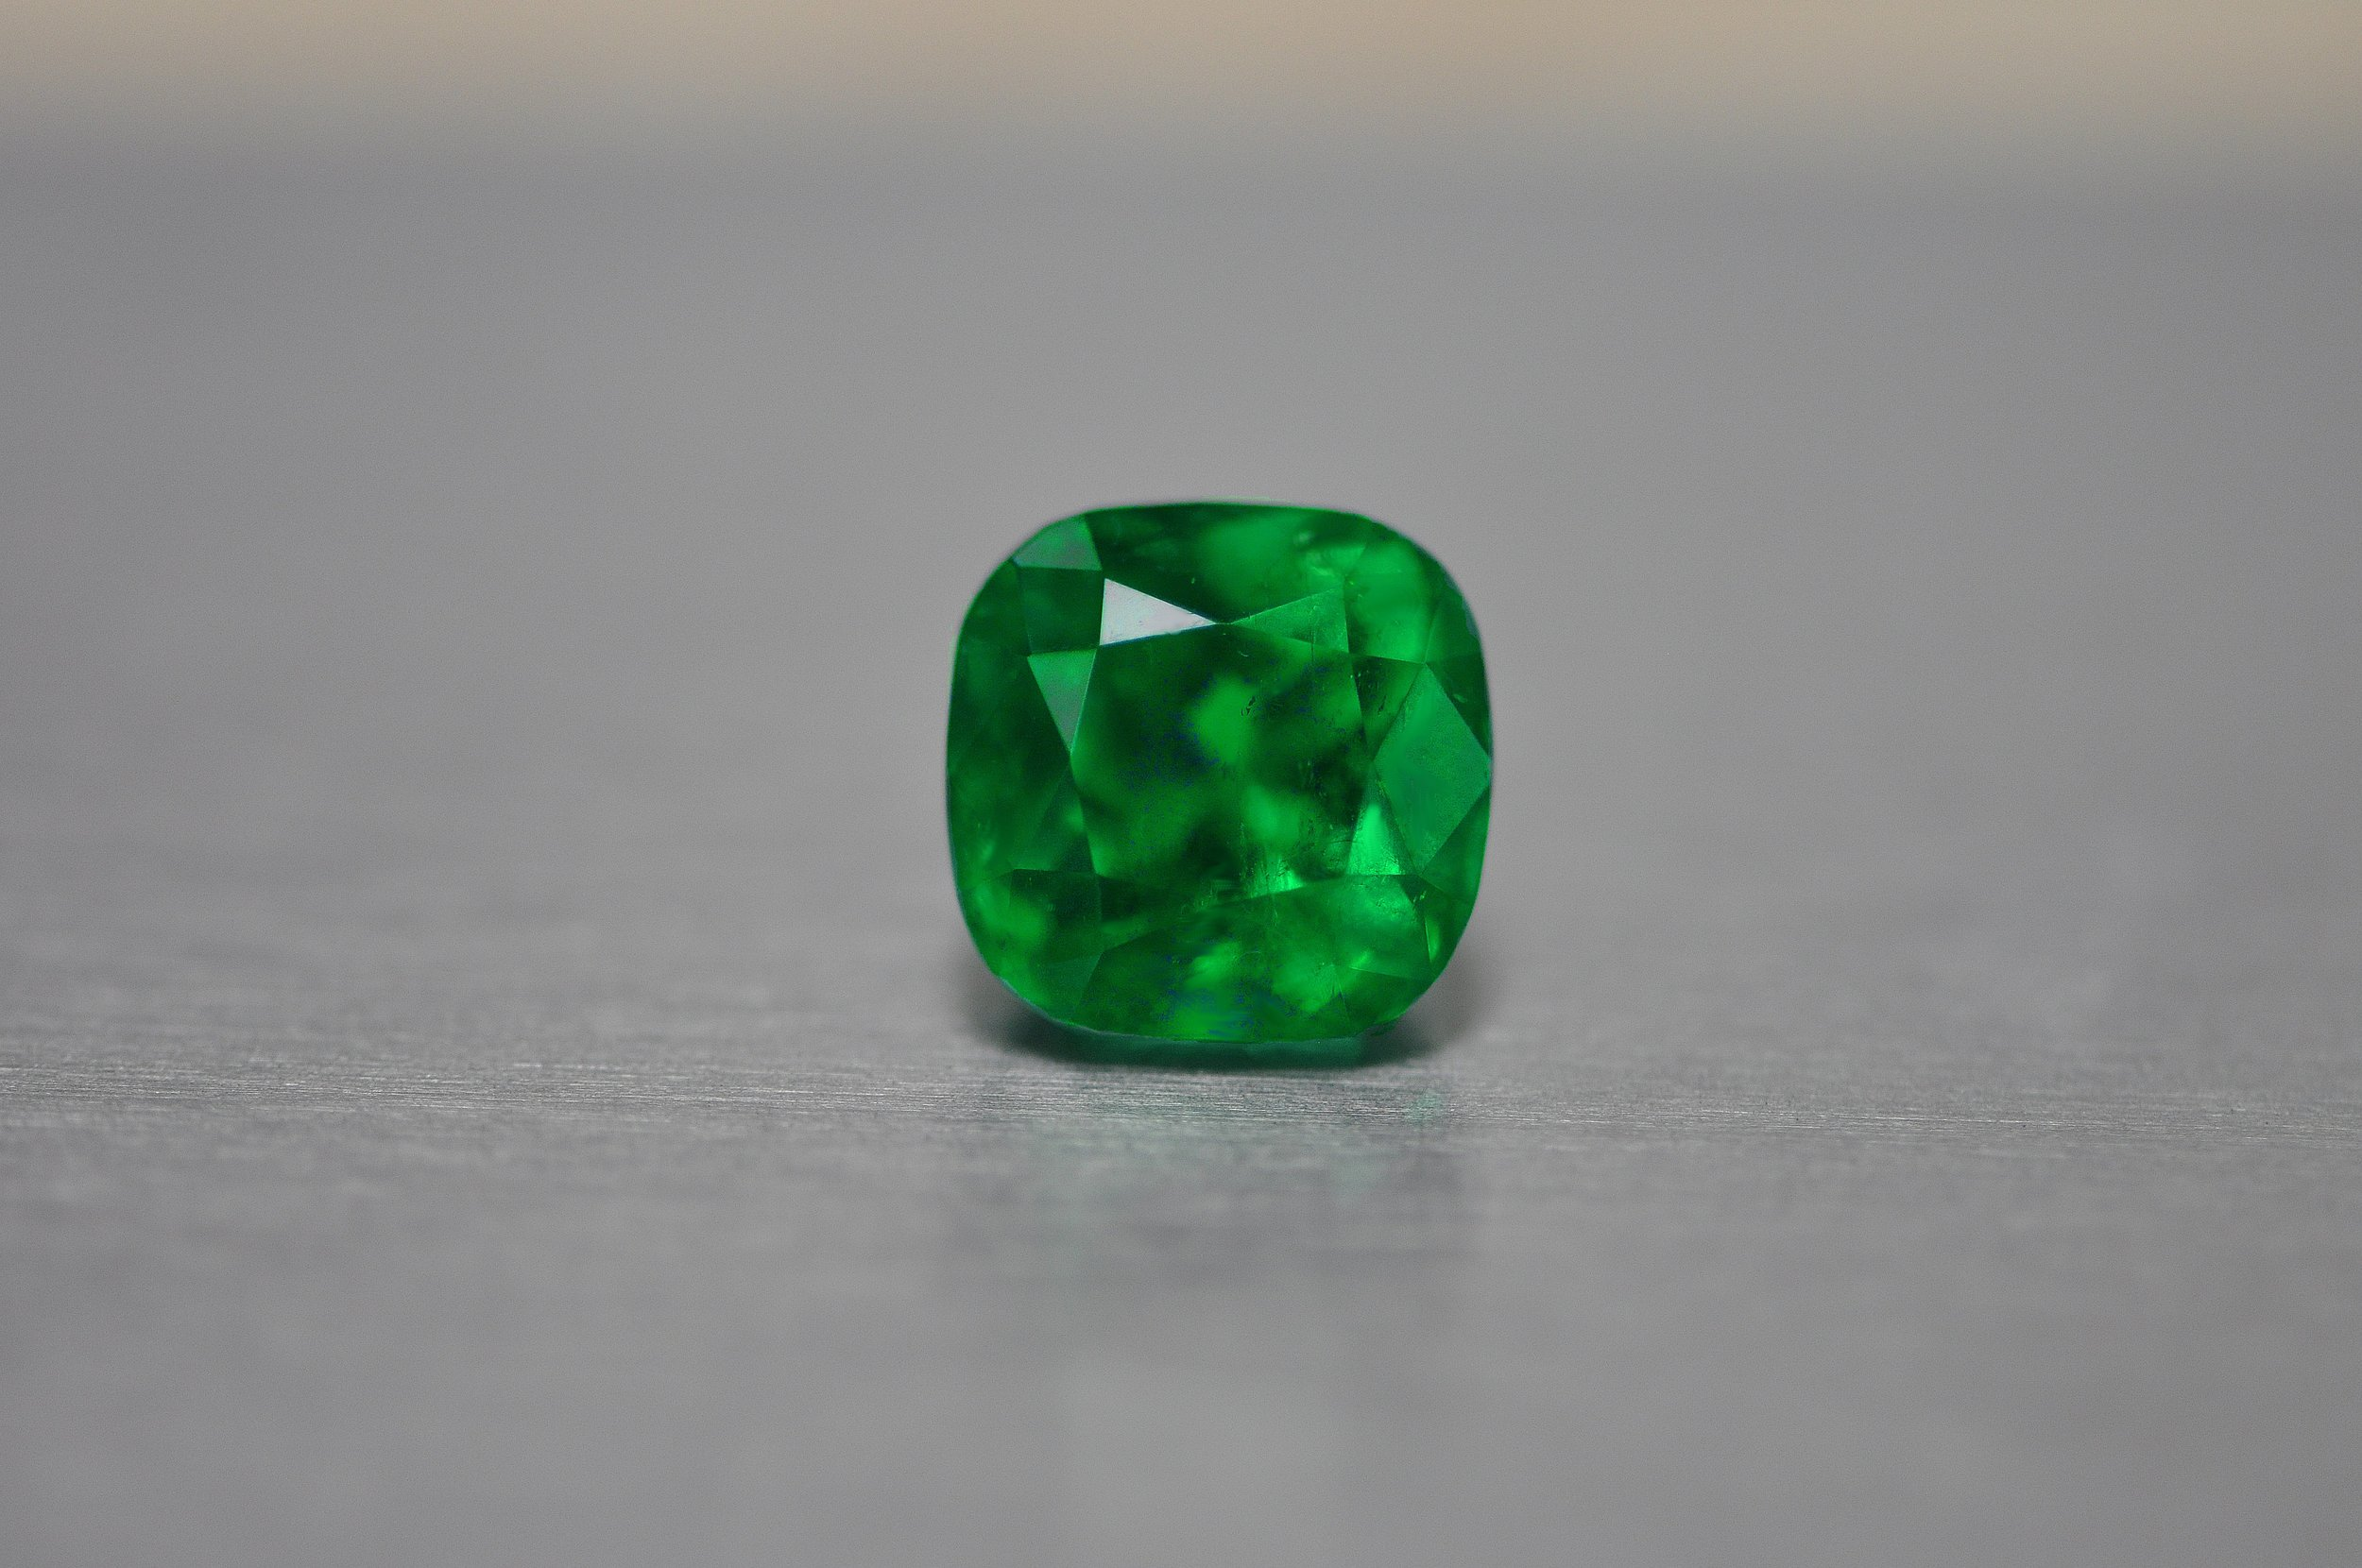 3.51ct Cushion Cut Emerald.jpg